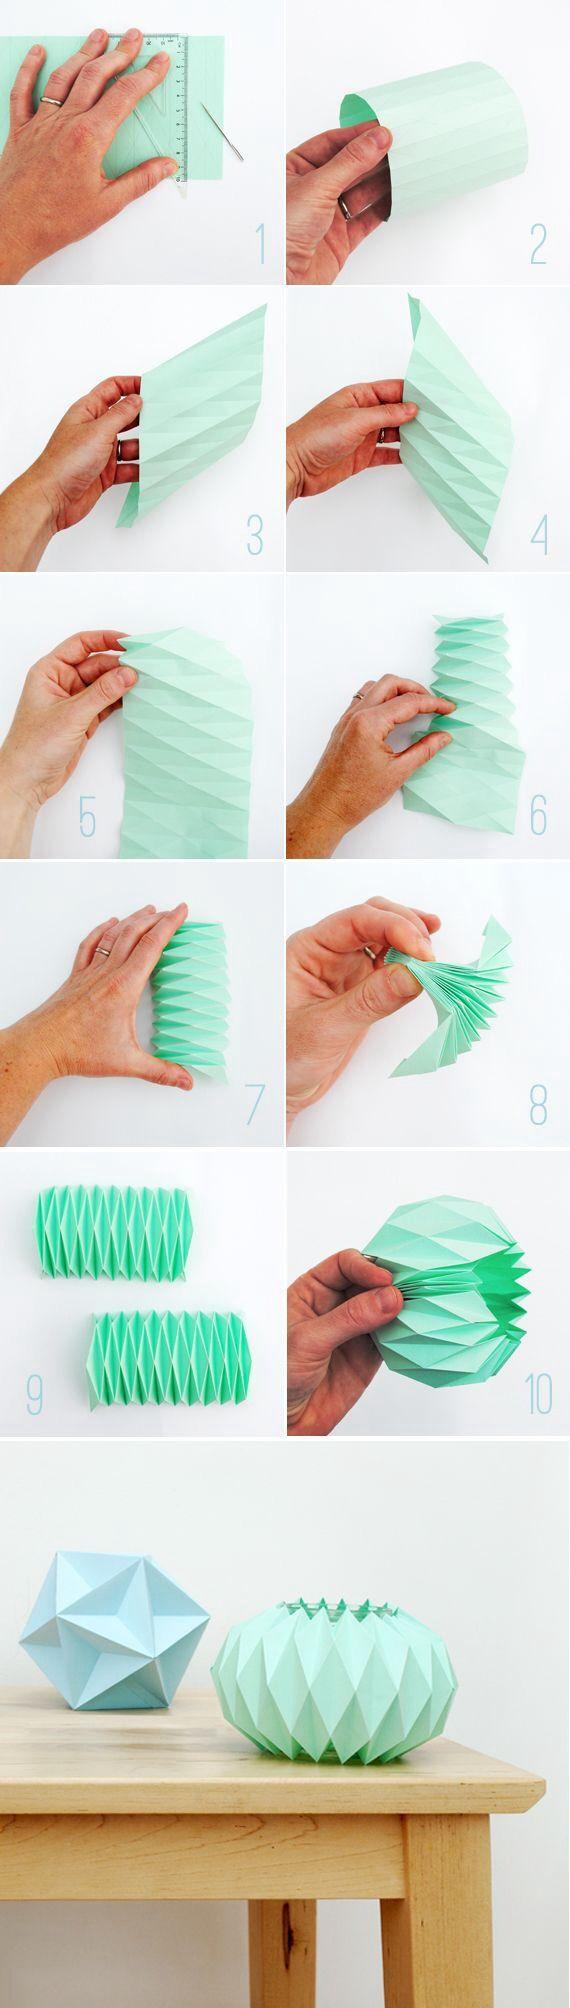 DIY origami light                                                                                                                                                                                 More